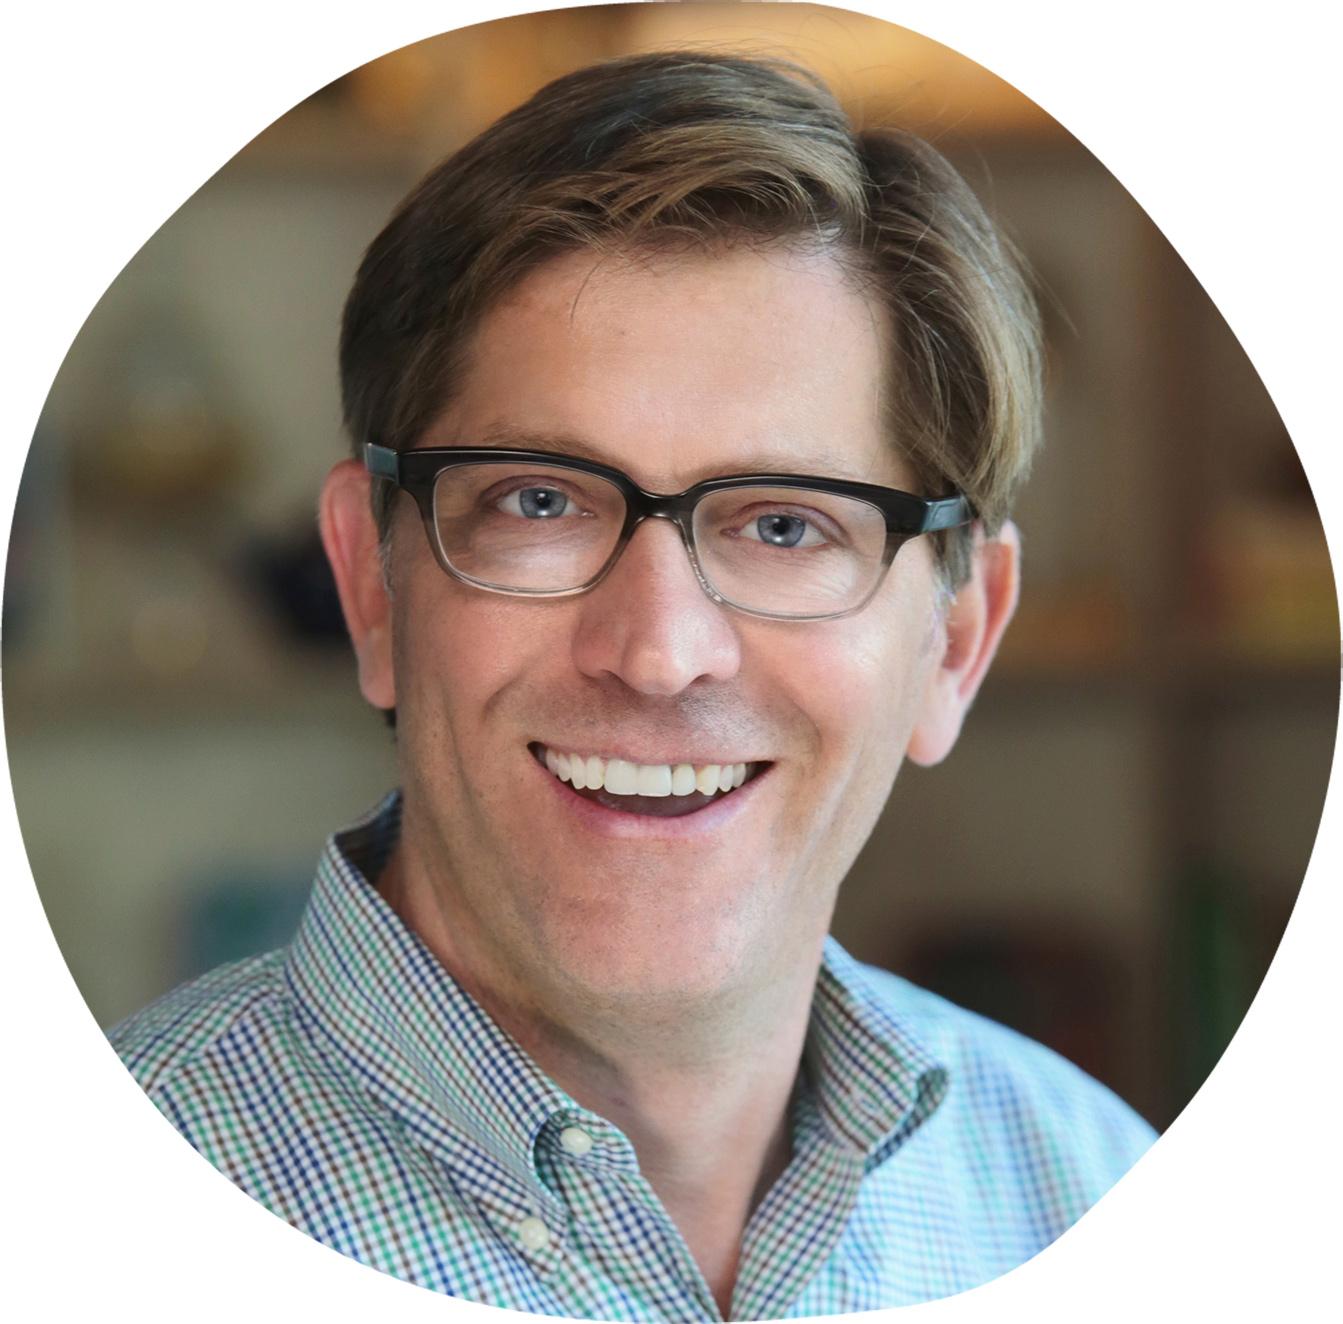 Mike Scheu  VP Sales & Marketing, Straus Family Creamery